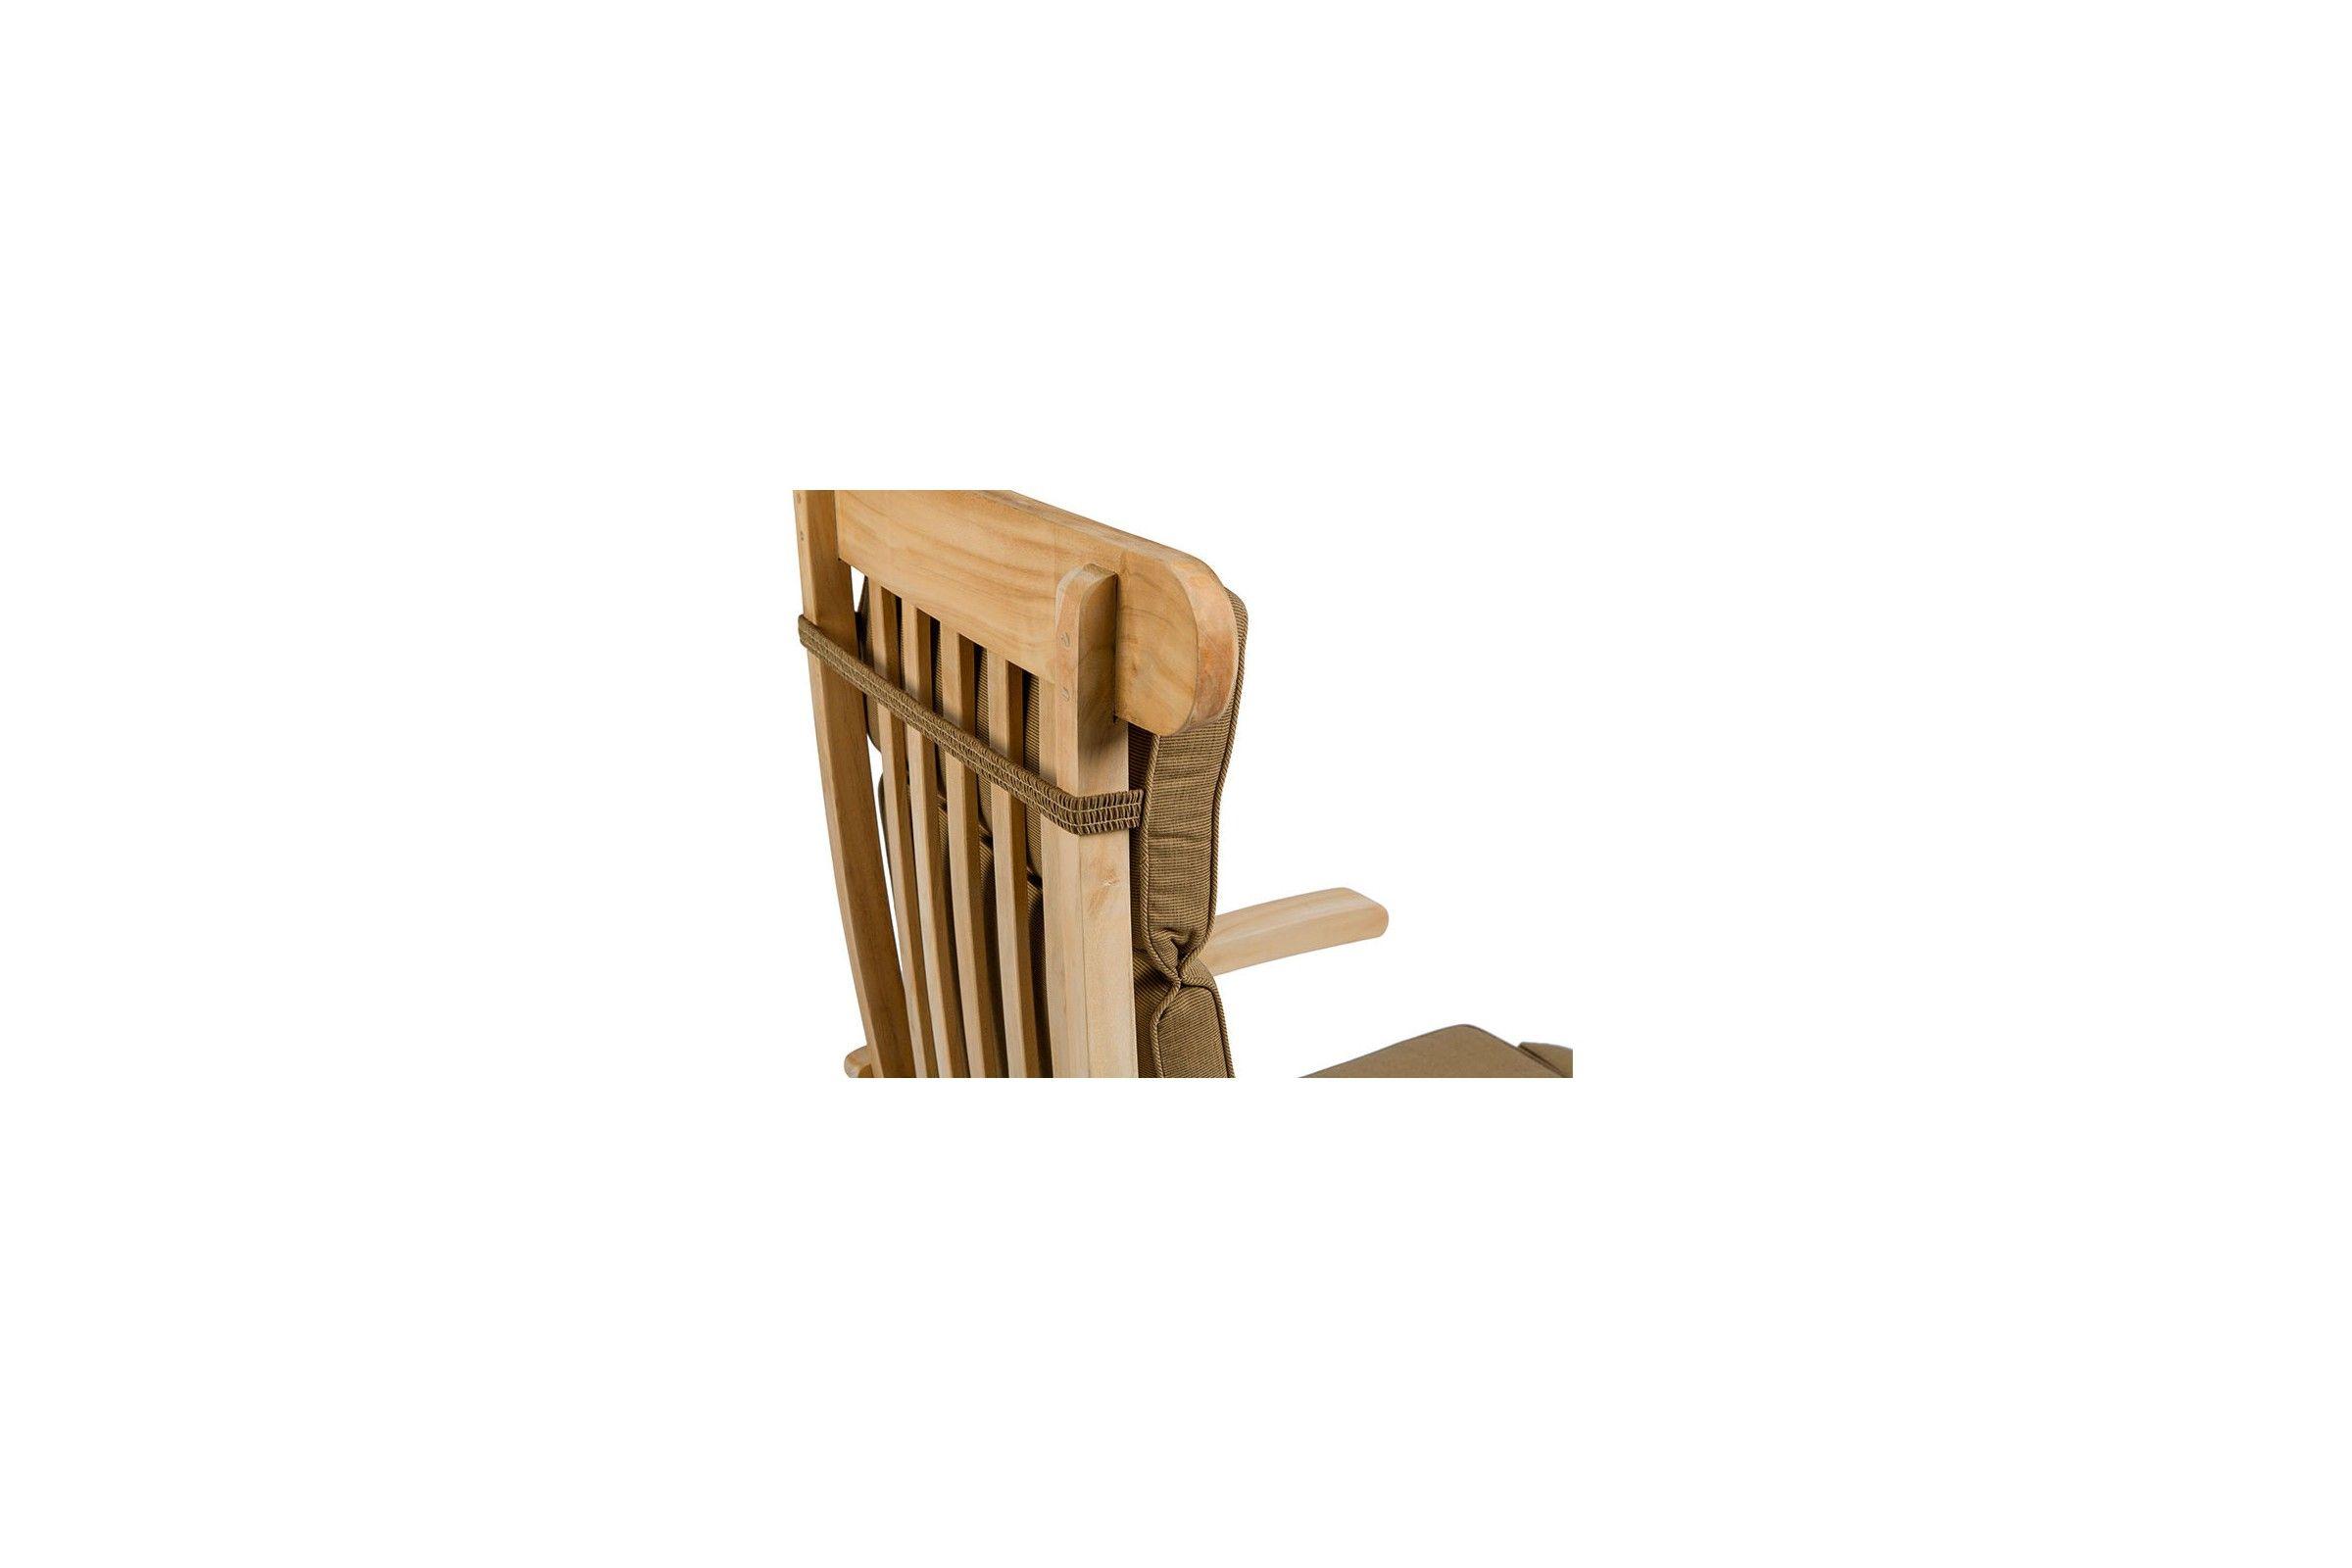 chaise longue pliante en teck massif steamer la galerie du teck. Black Bedroom Furniture Sets. Home Design Ideas